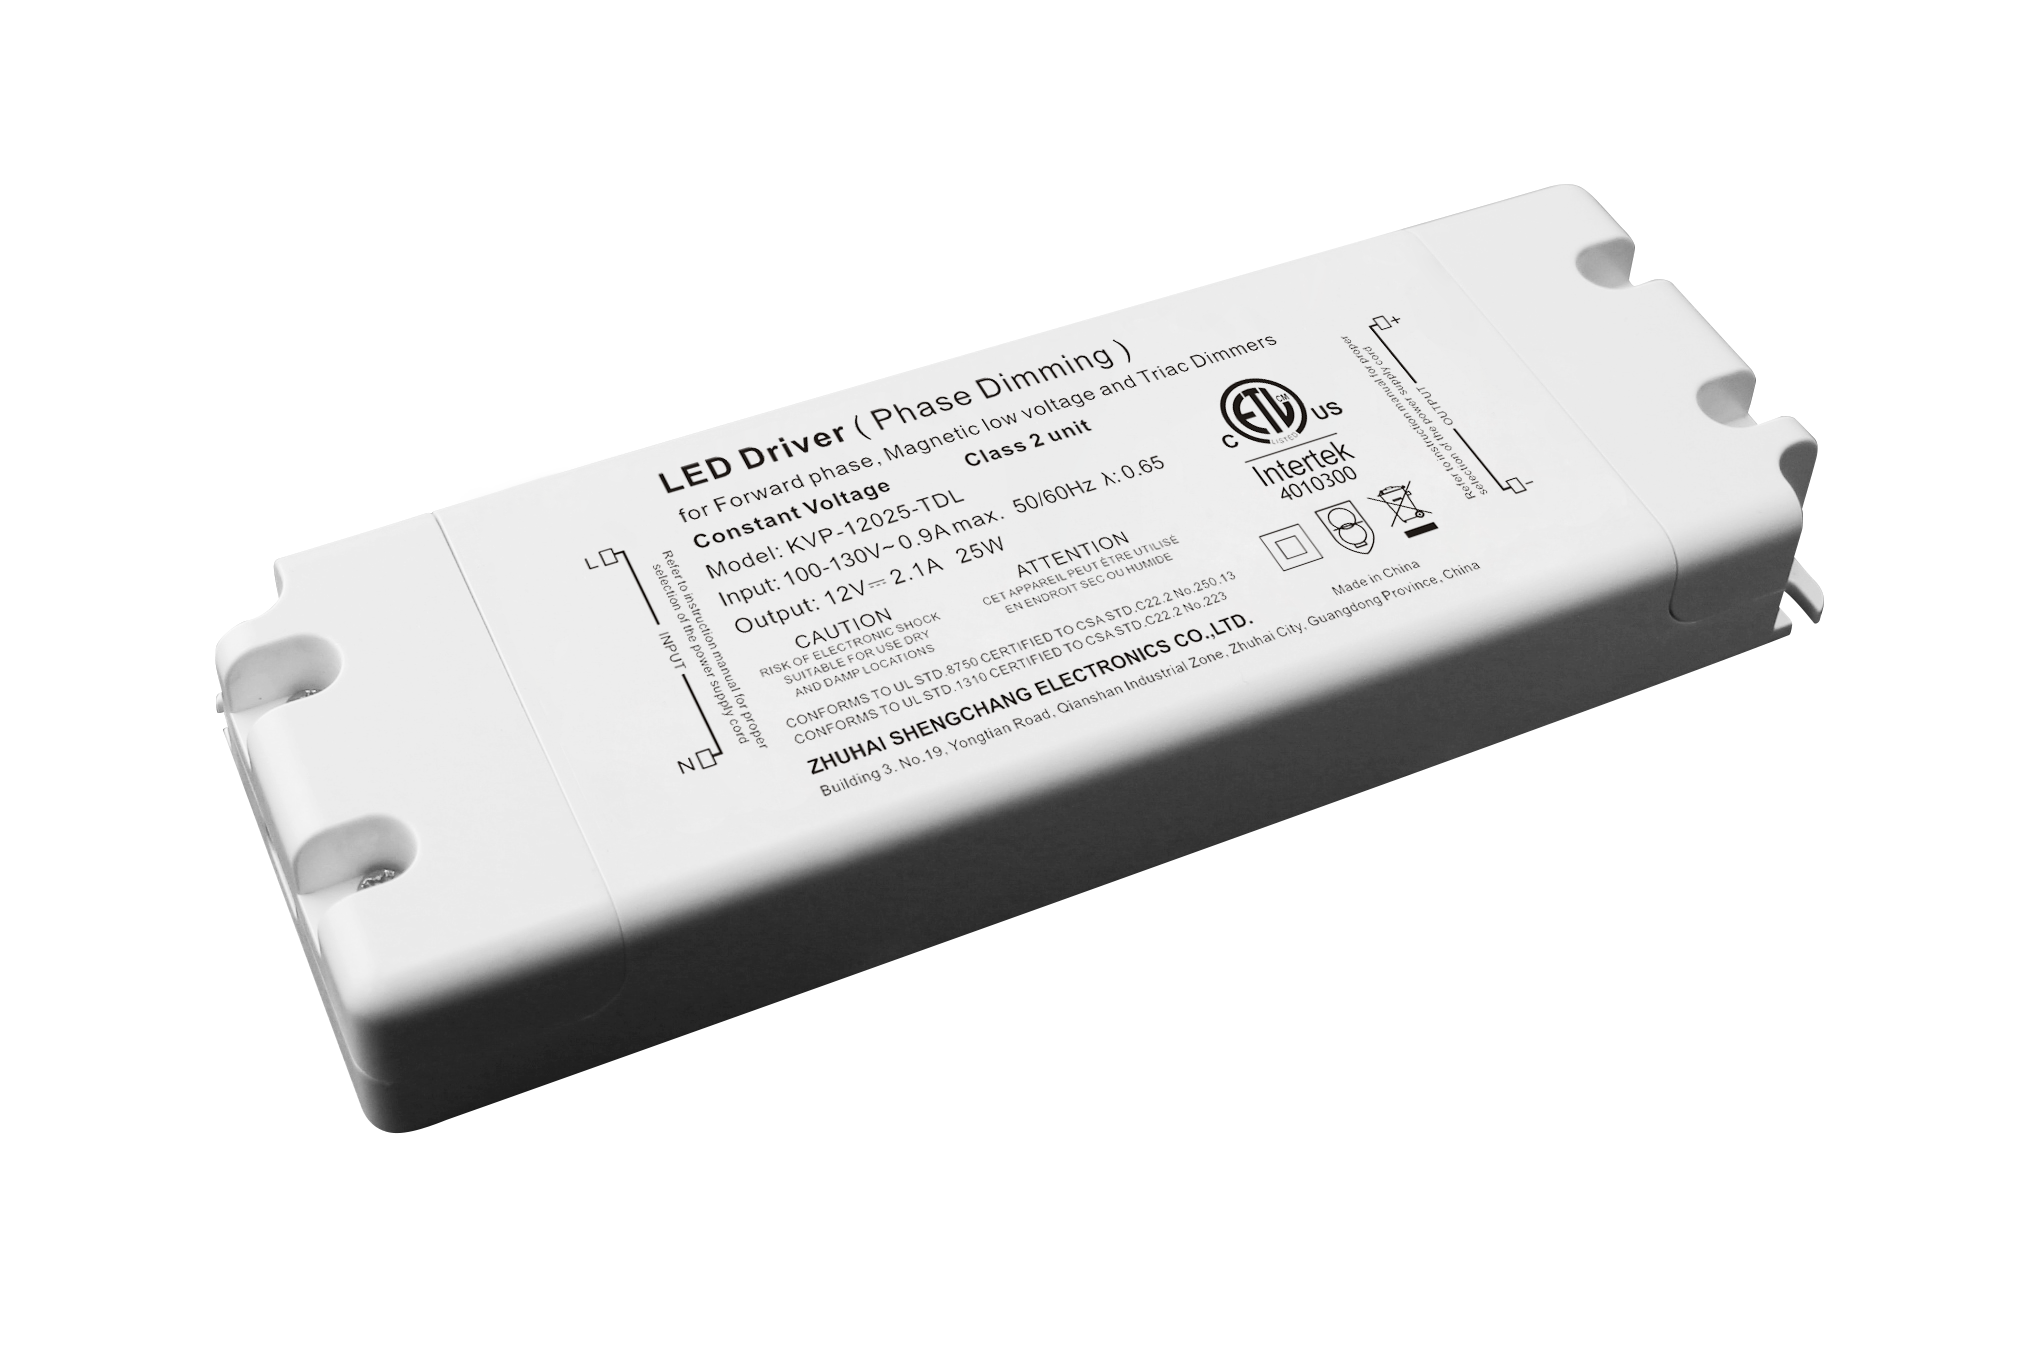 120VAC KVP series 25W constant voltage triac dimmable driver